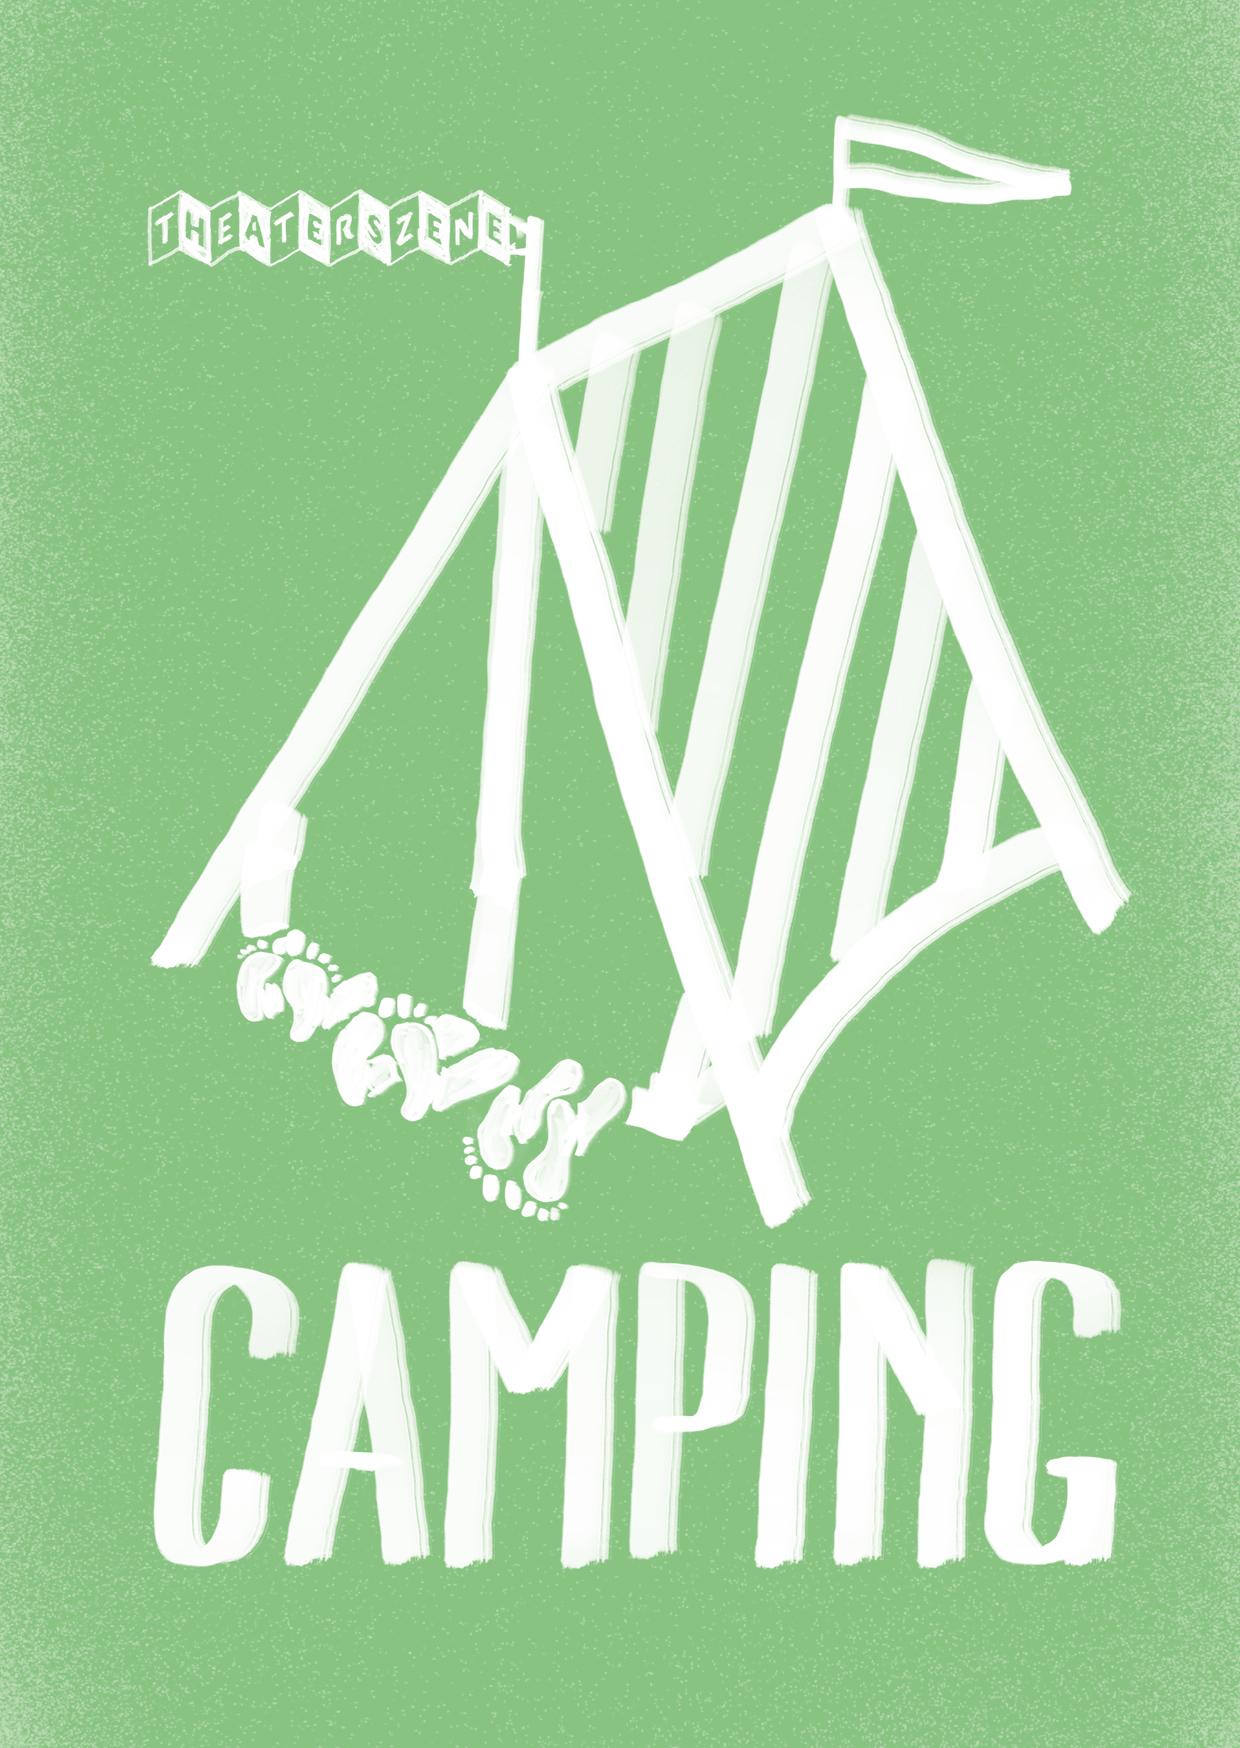 A6 Ts Camping